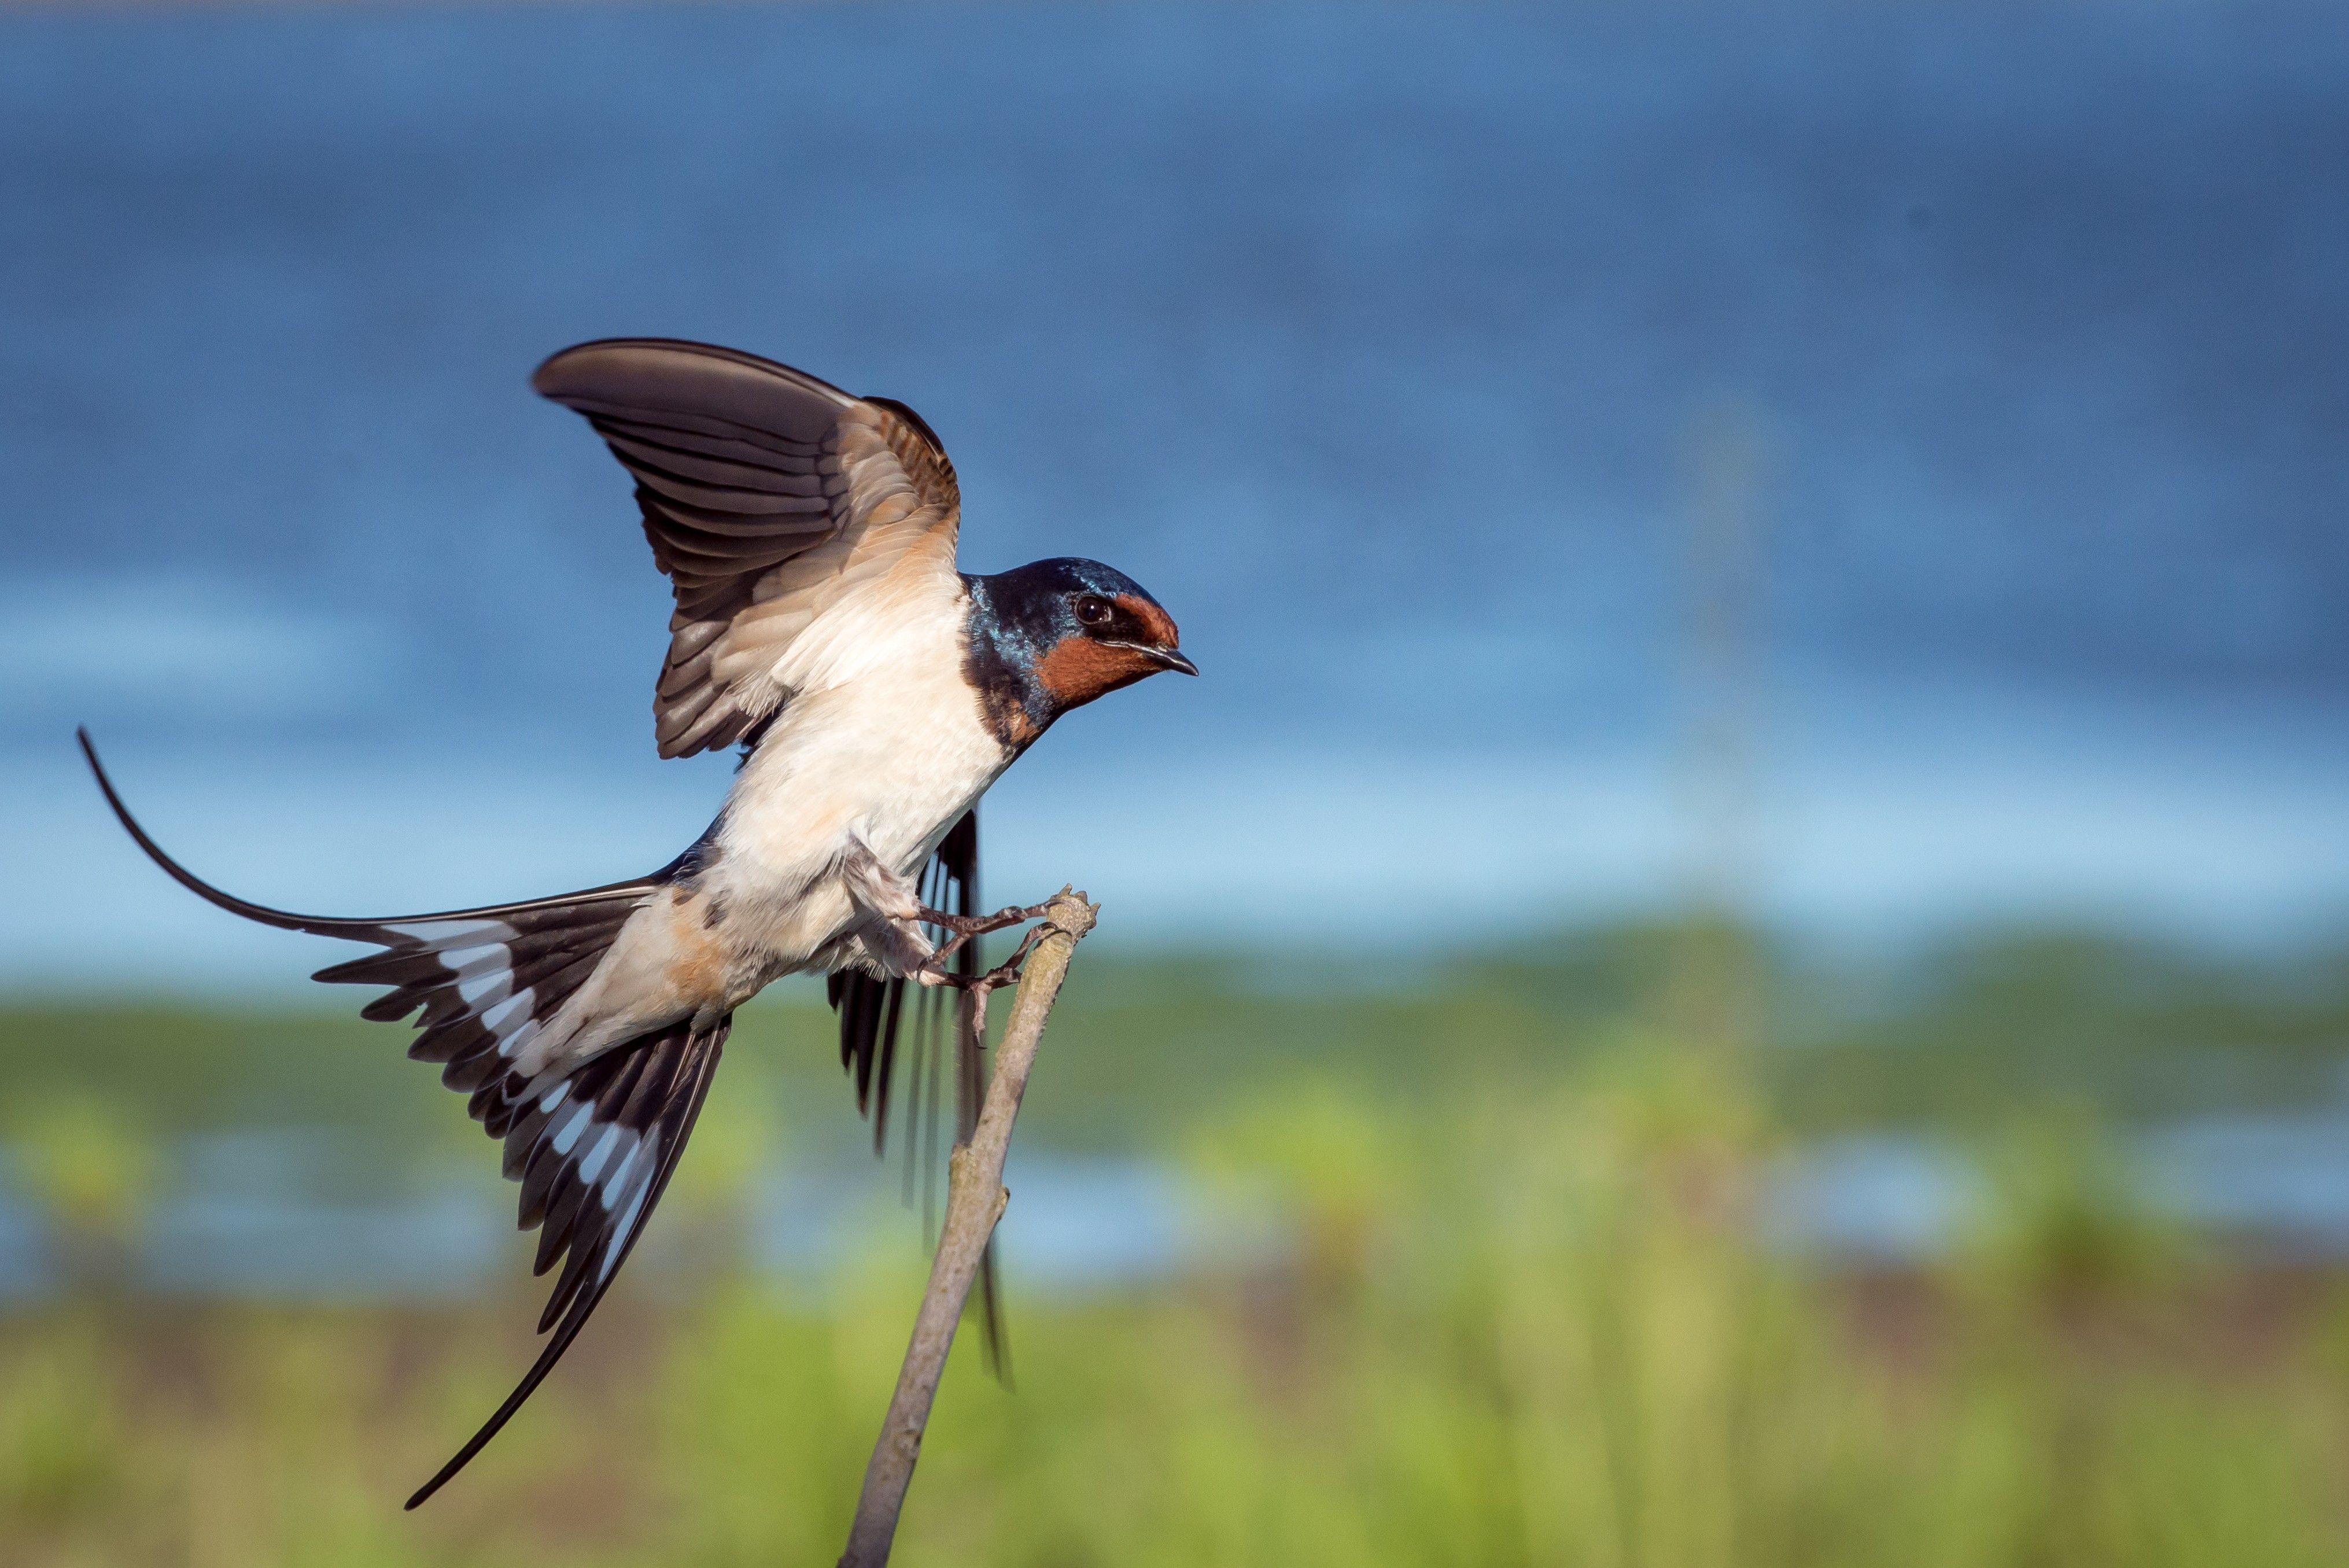 Coucal Bulbul Bird Flying Wallpaper Free Download Hd Bird Photo Animals Birds Flying